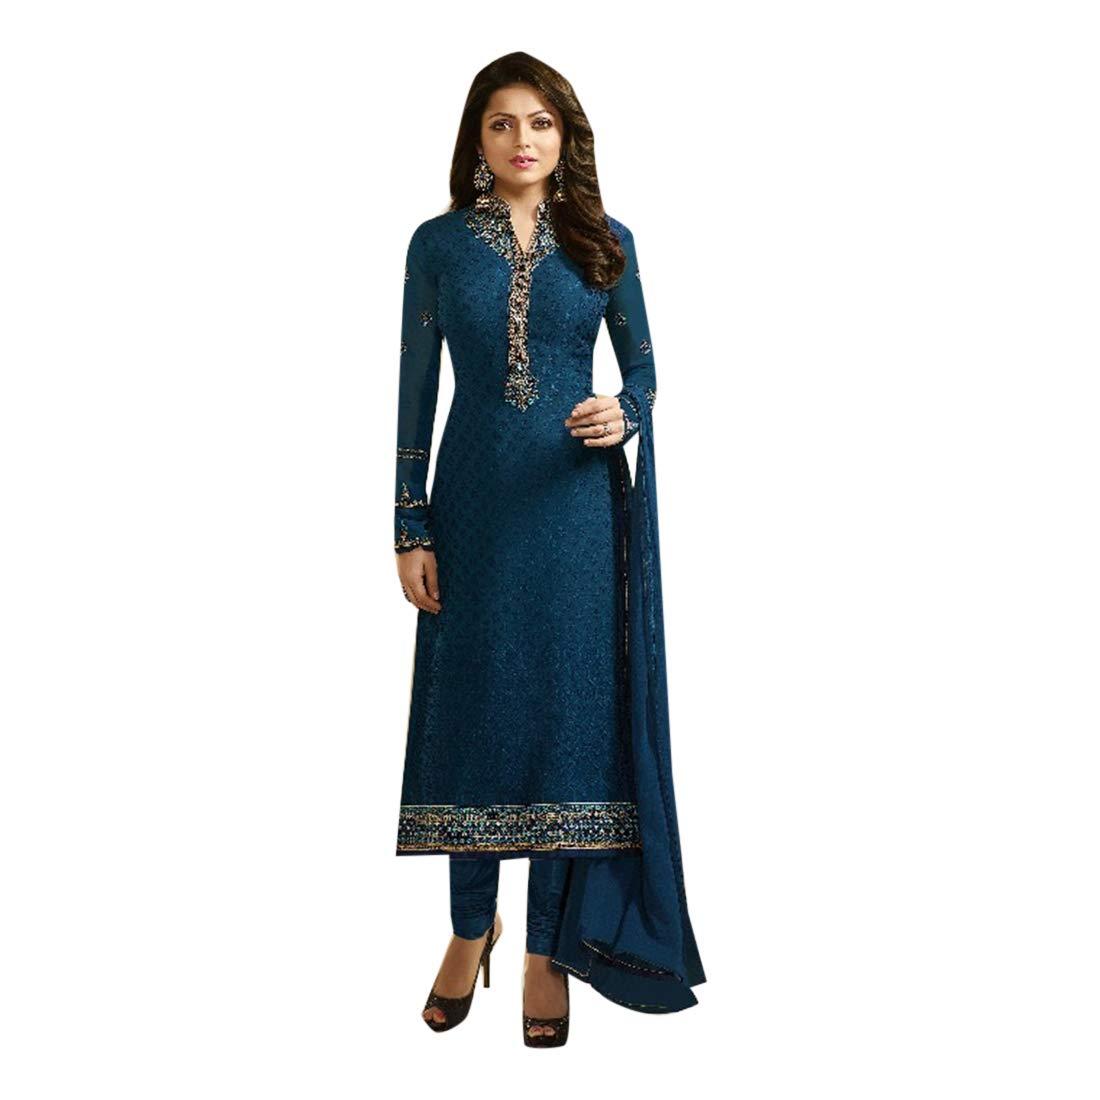 Ethnic Navy bluee Brasso Santoon Heavy Embroidery Straight Salwar Kameez Bollywood Designer Indian Muslim 7263